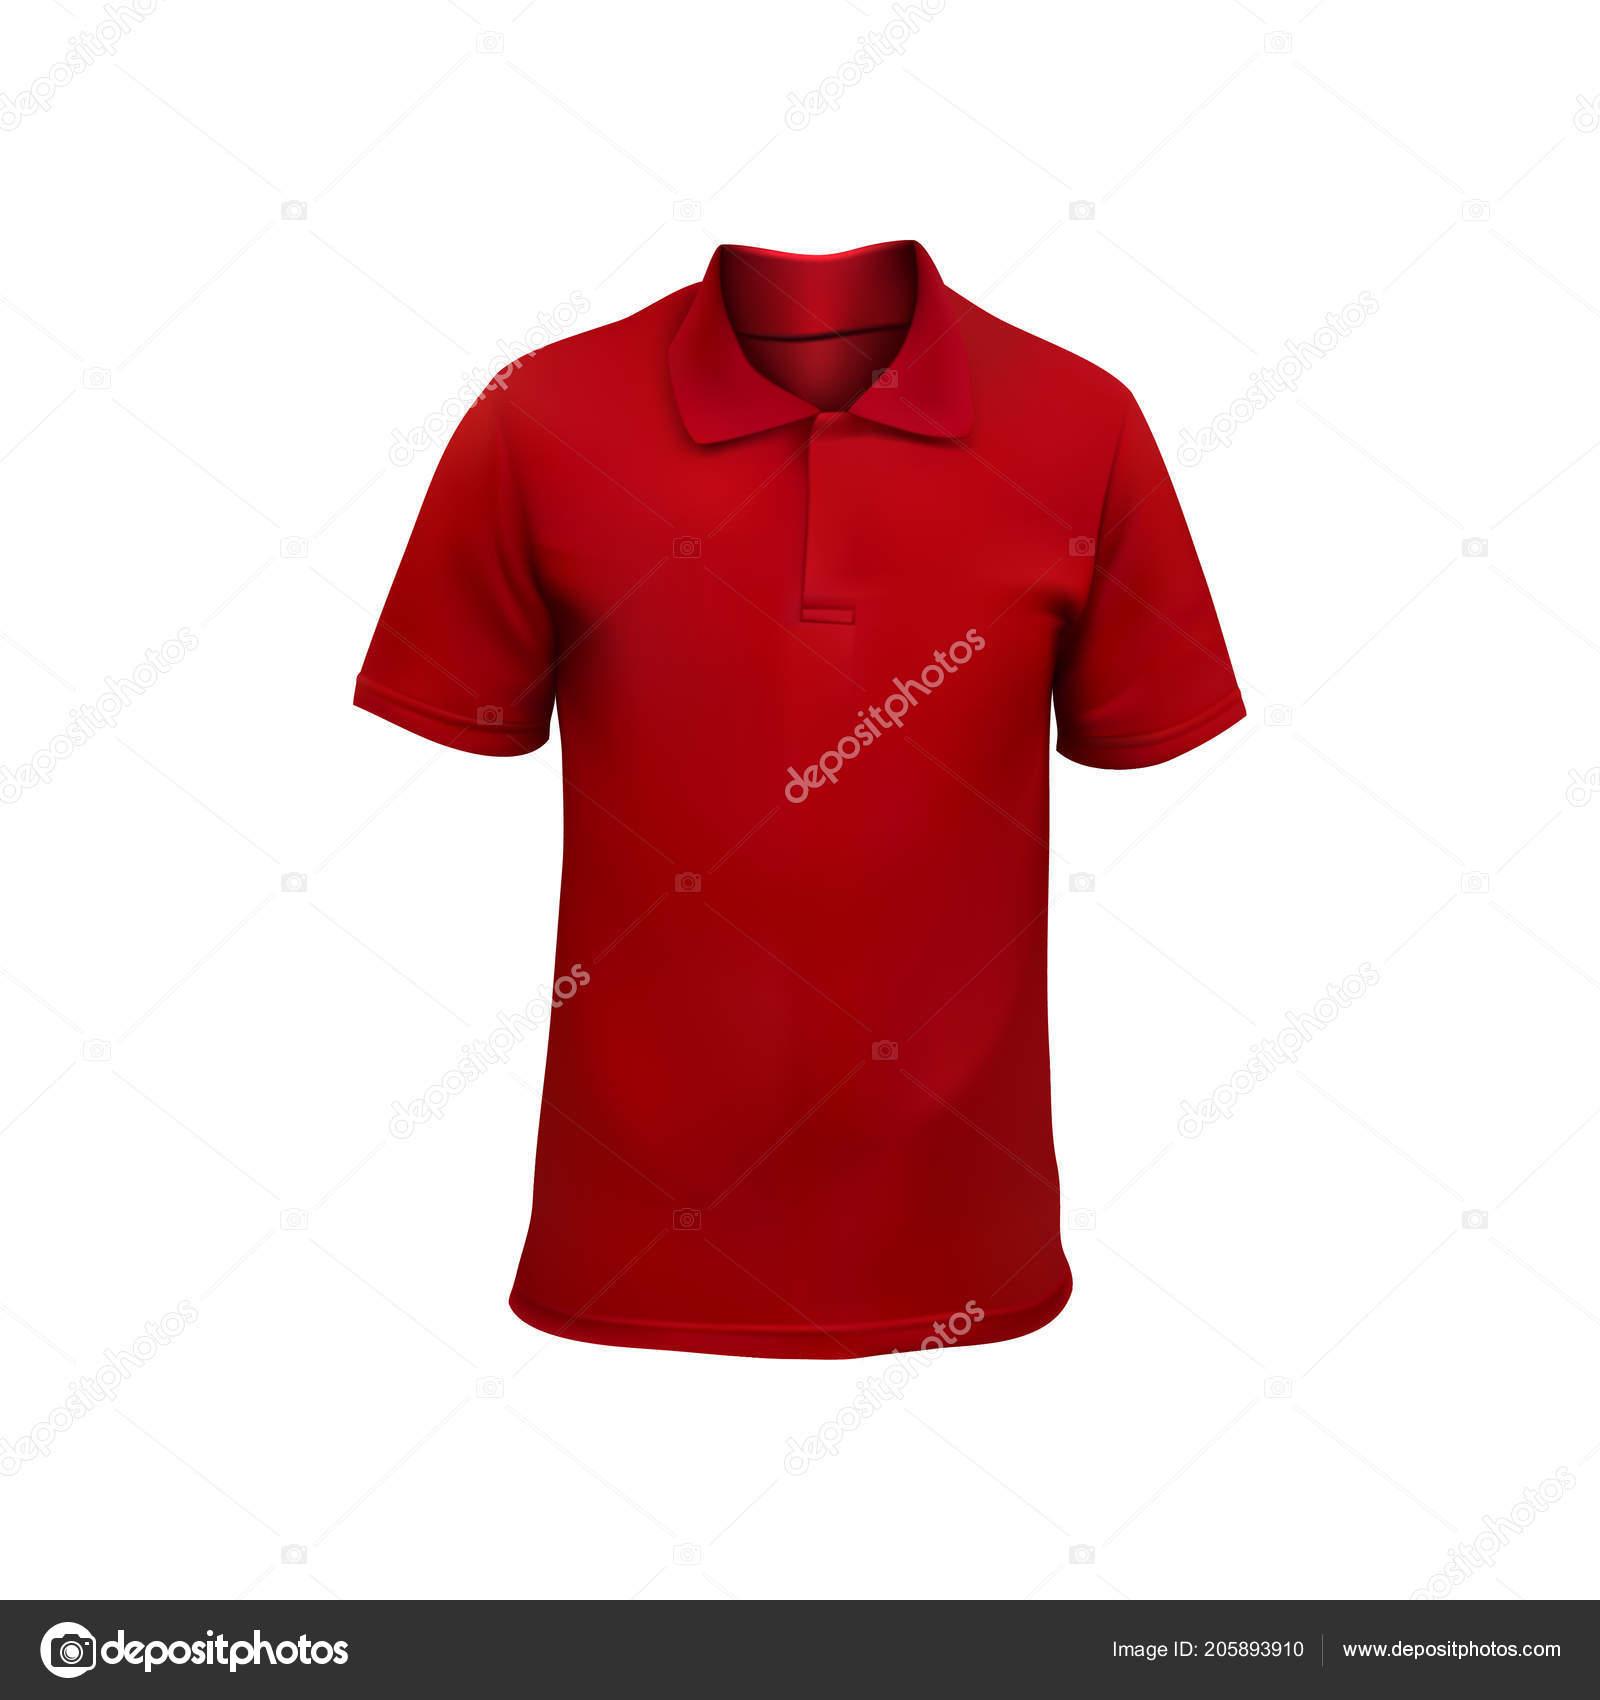 011b1b382773 Κόκκινο Ανδρικό Shirt Ρεαλιστική Κοροϊδεύω Εικονογράφηση Διάνυσμα– εικονογράφηση  αρχείου